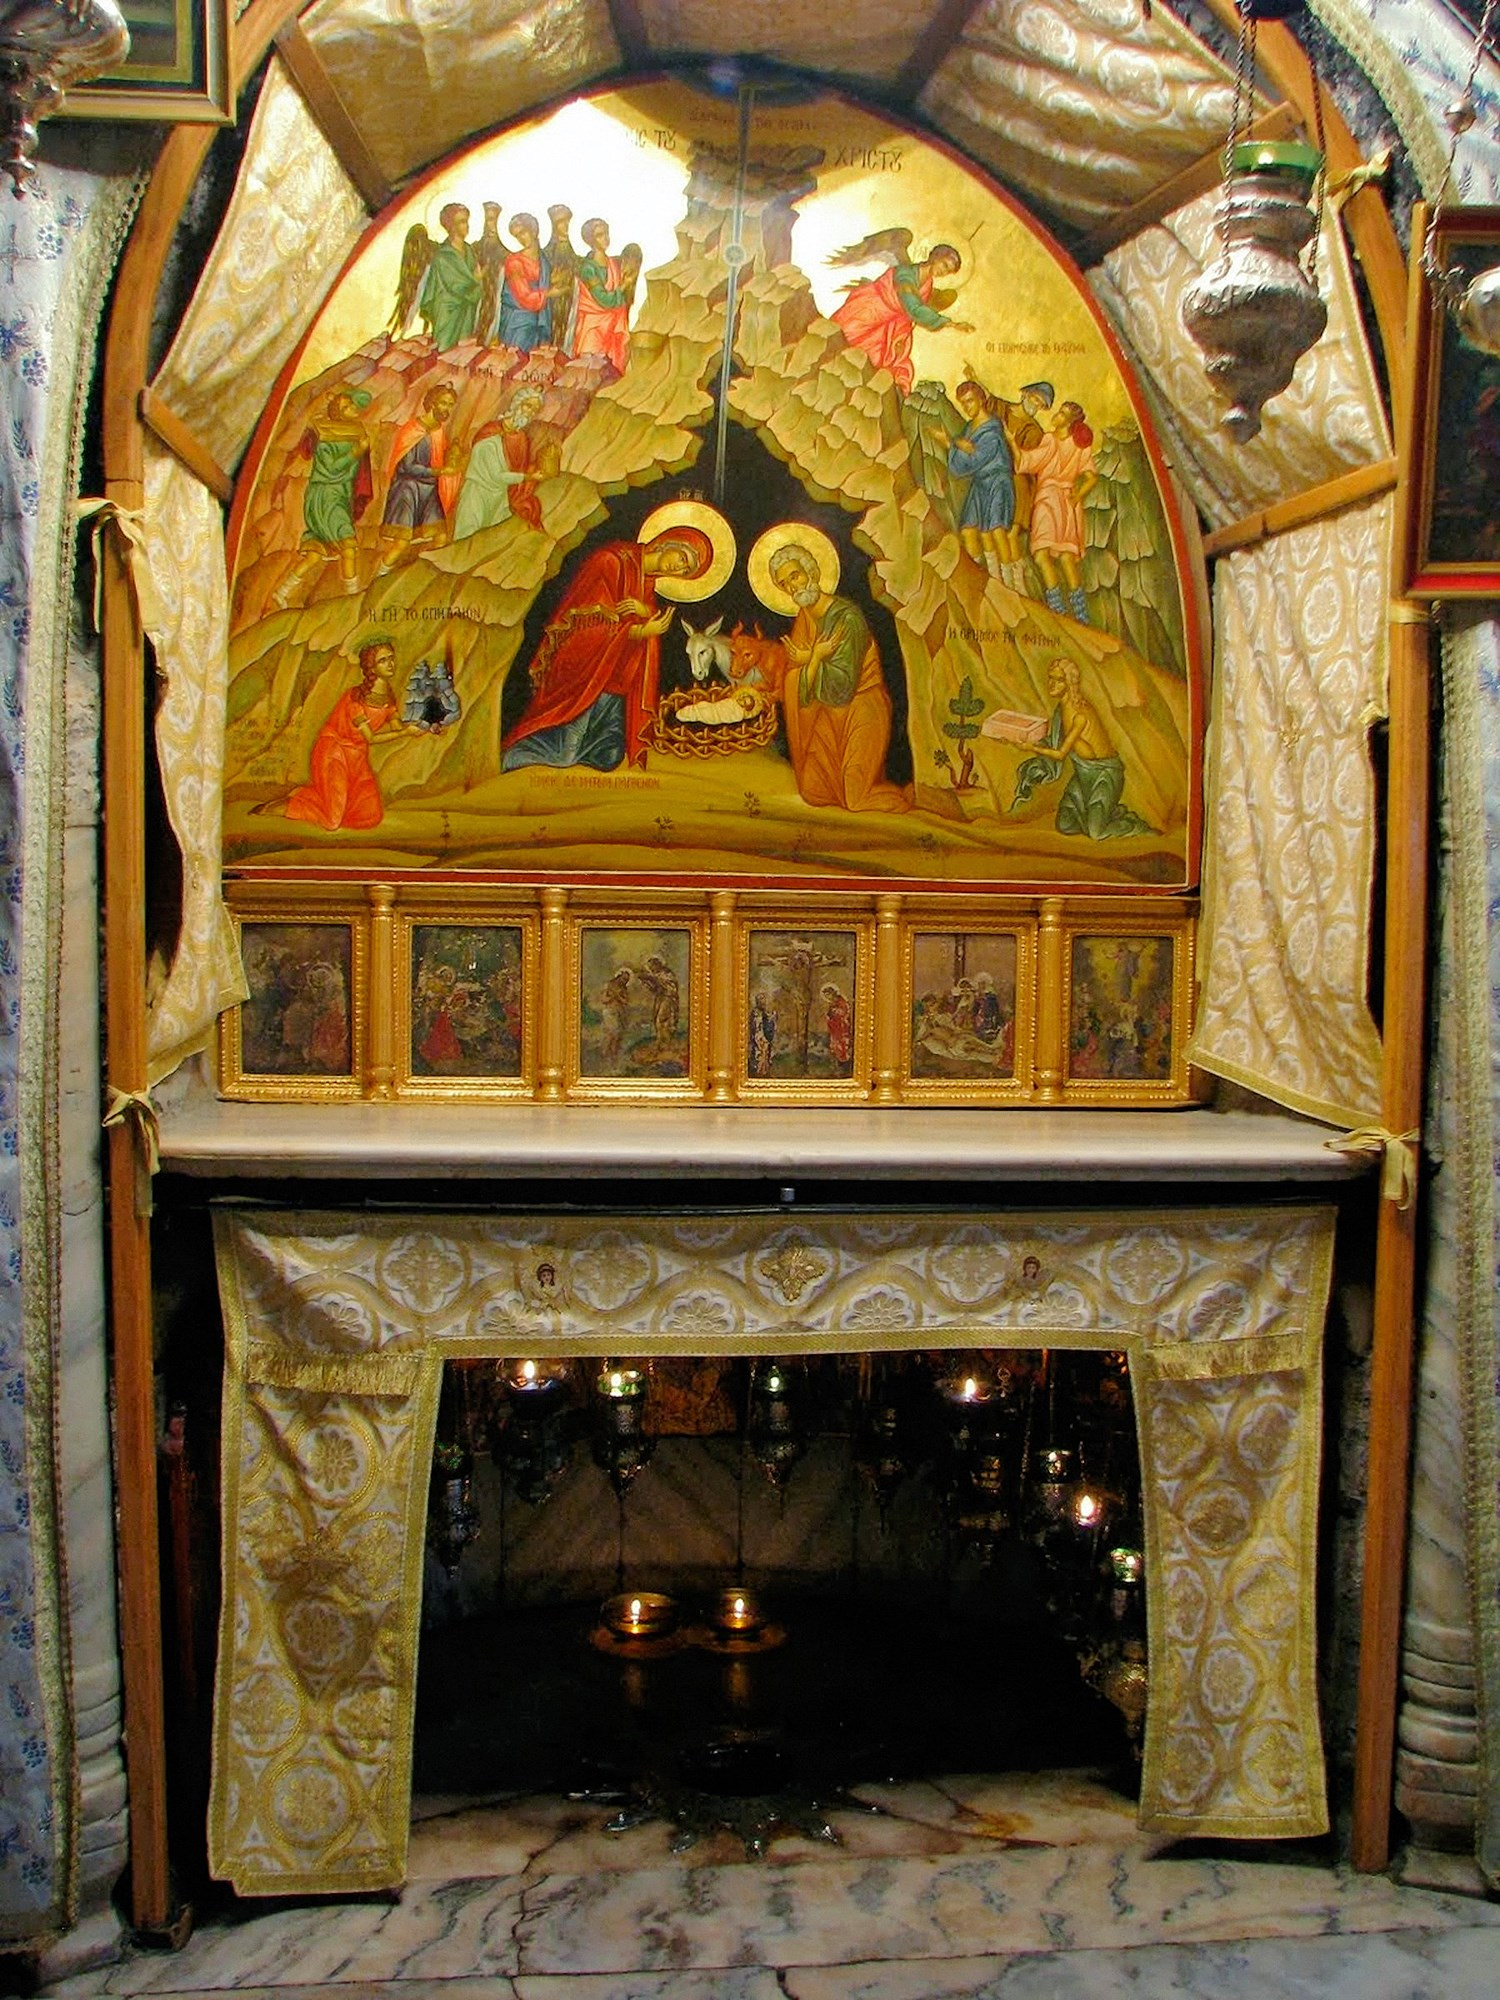 00-church-of-the-nativity-240116